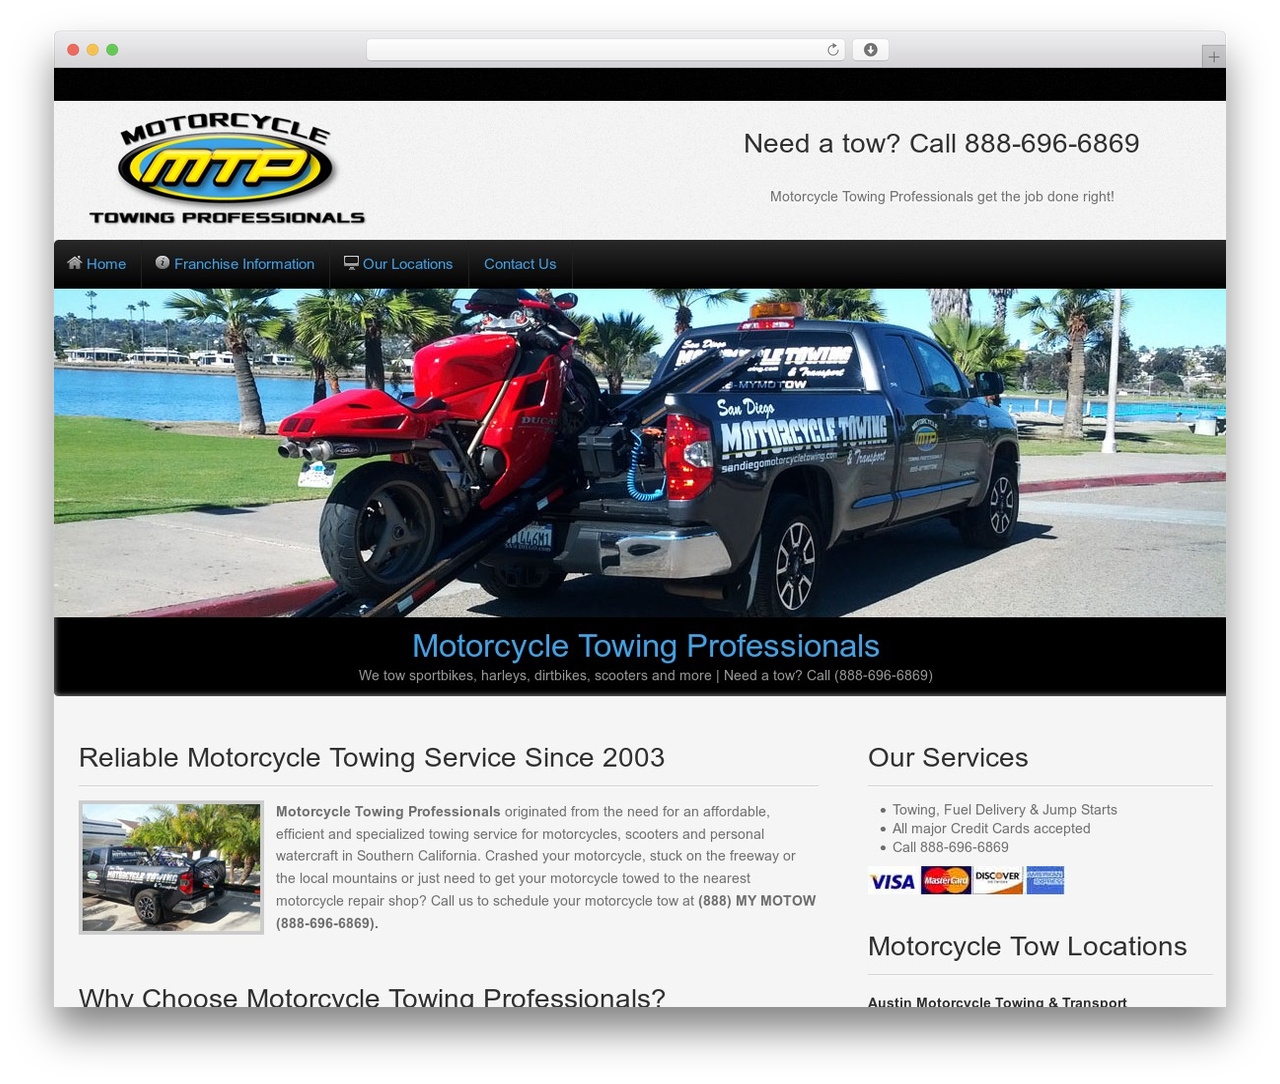 Gantry Theme for WordPress WordPress website template - motorcycletowingprofessionals.com